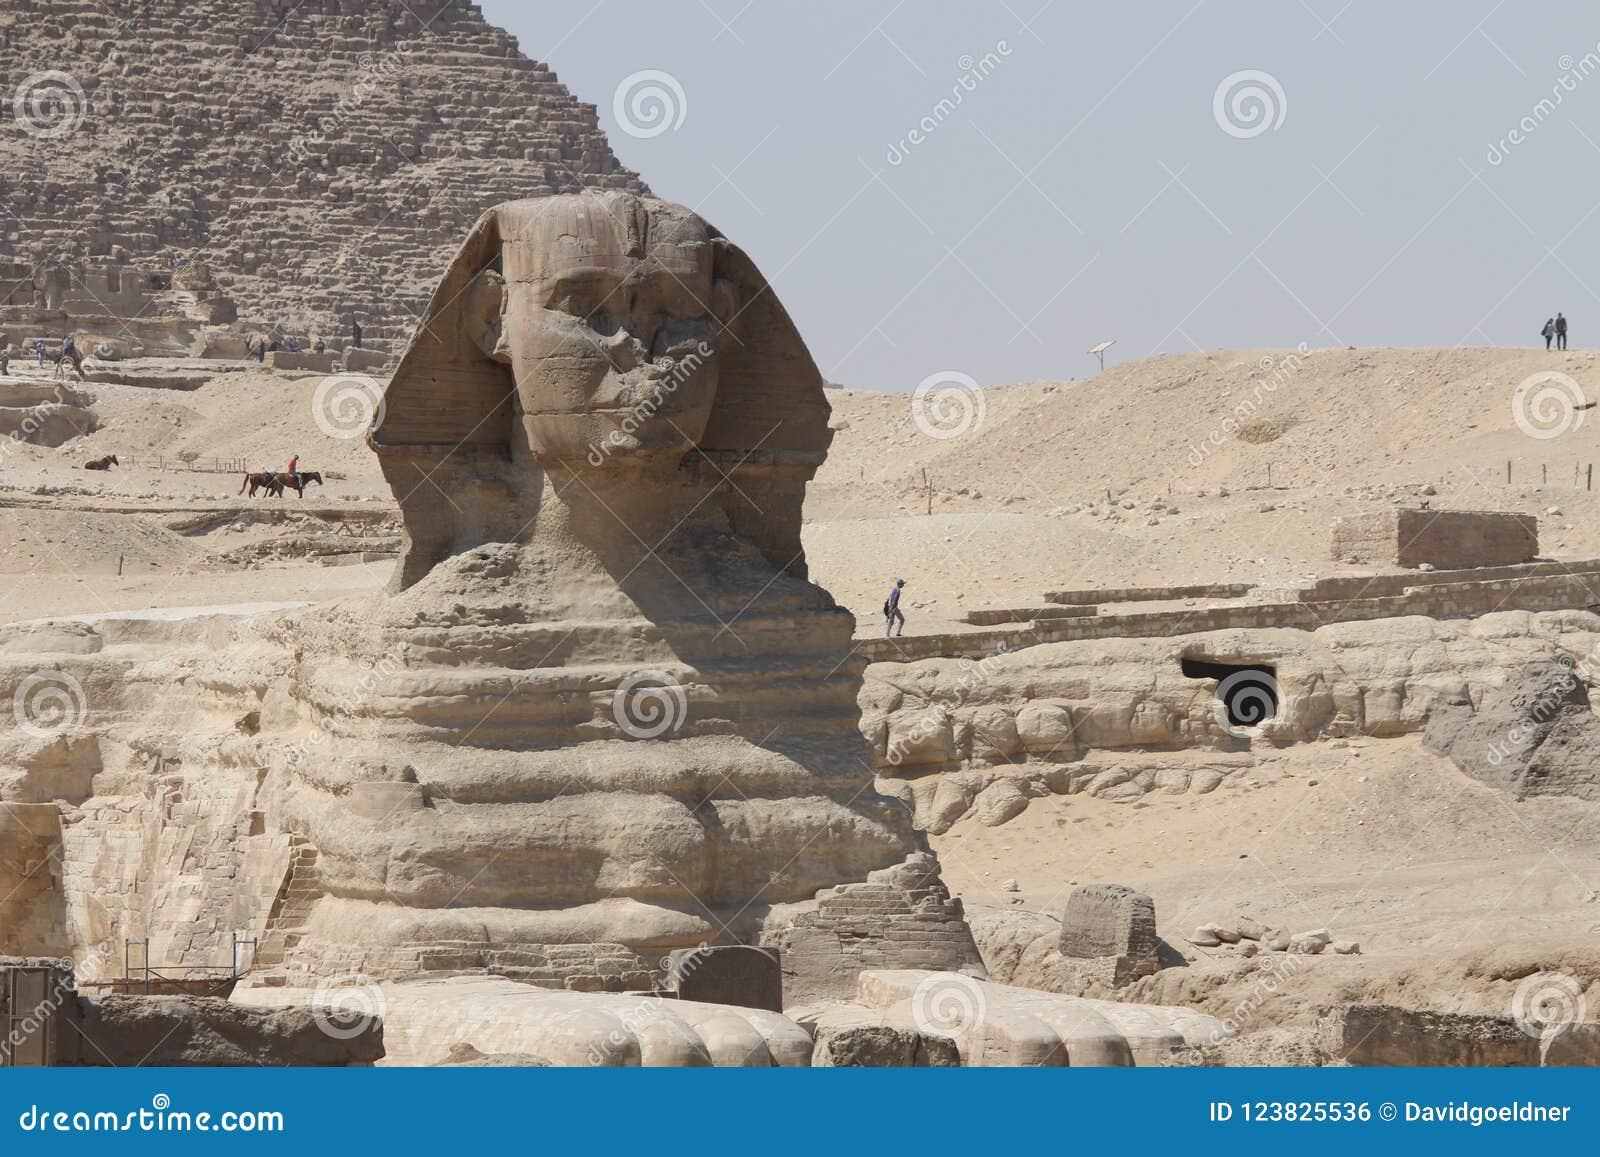 Iconisch, oud en vorstelijk - de Sfinx, Kaïro Egypte